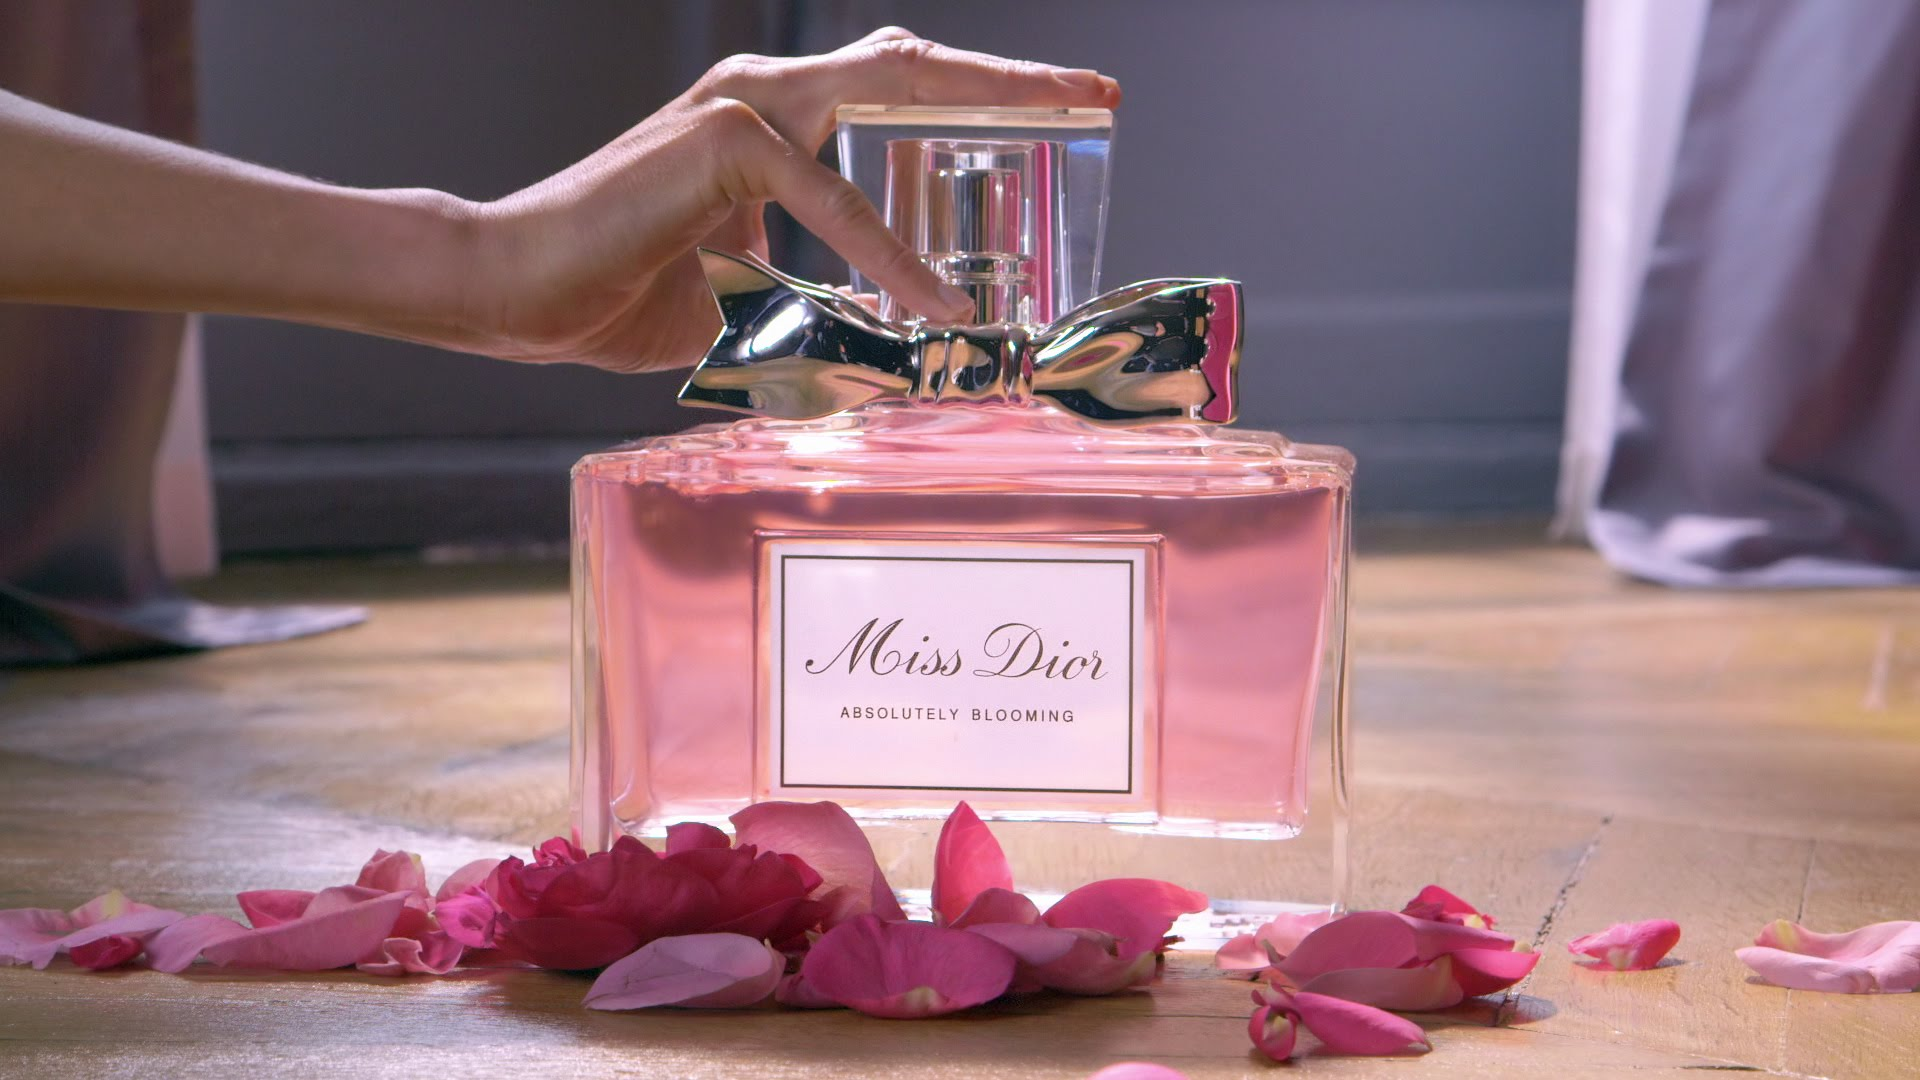 Miss Dior 'ABSOLUTELY BLOOMING' BEST PERFUME BEST SELLER PERFUME